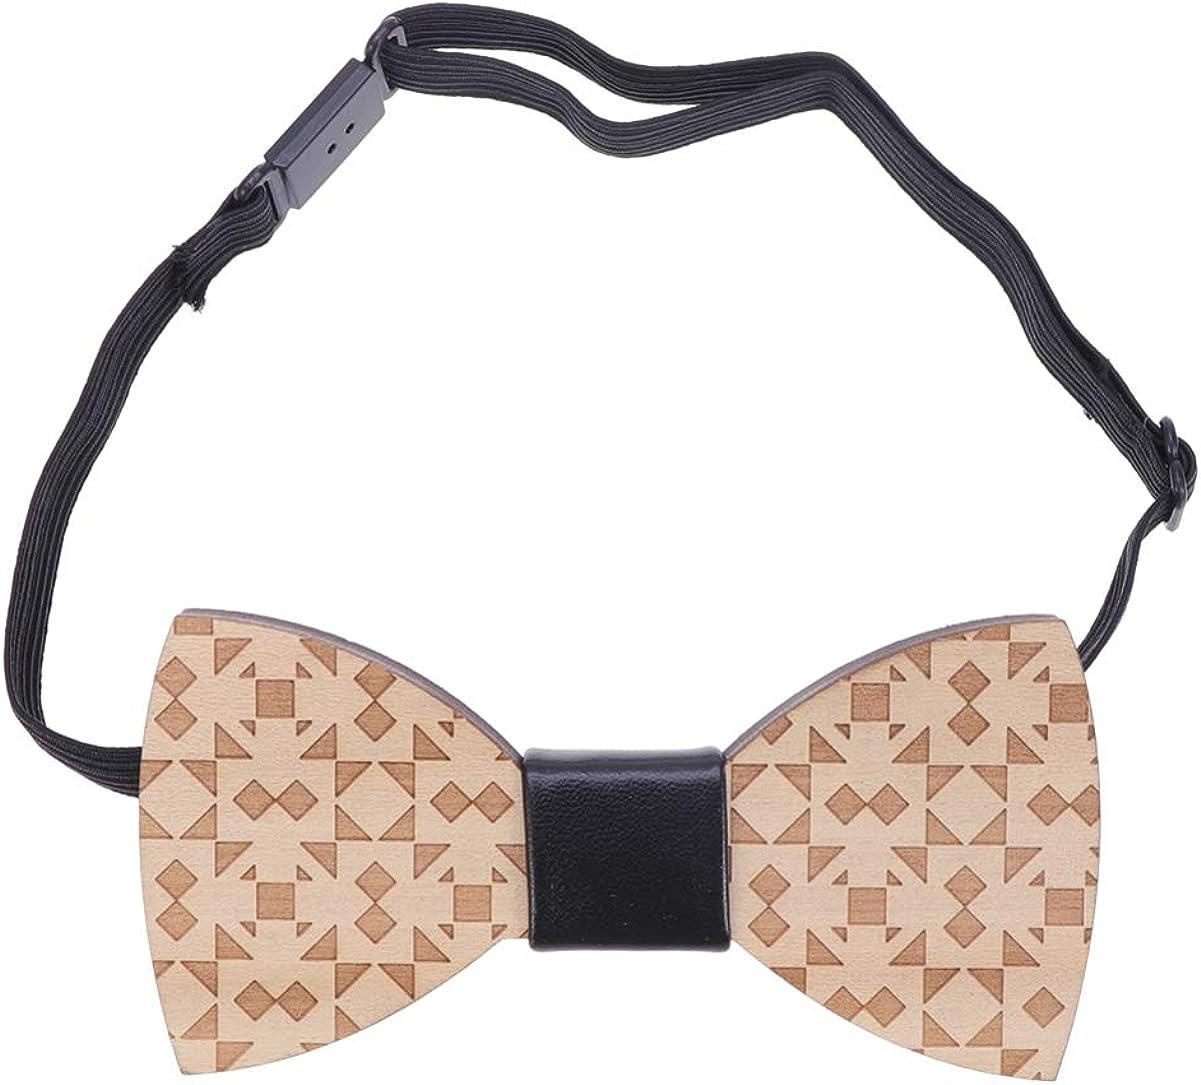 SUPVOX 1 Pc Bowtie Uniuqe Geometric Style Creative Decorative Bow-knot Cravat Clothes Accessory for Festival Party Wedding